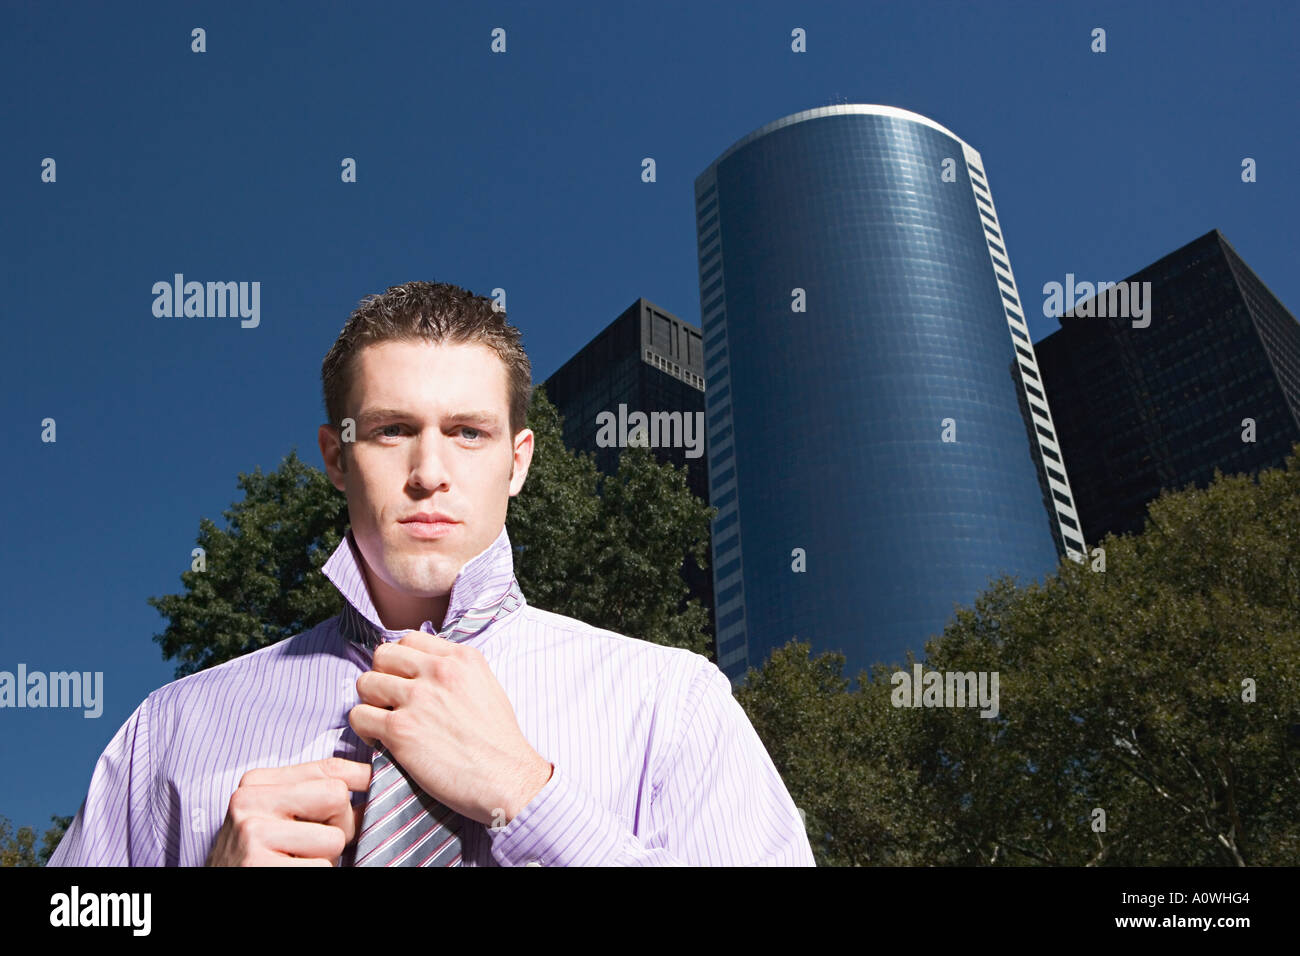 Male office worker adjusting necktie - Stock Image